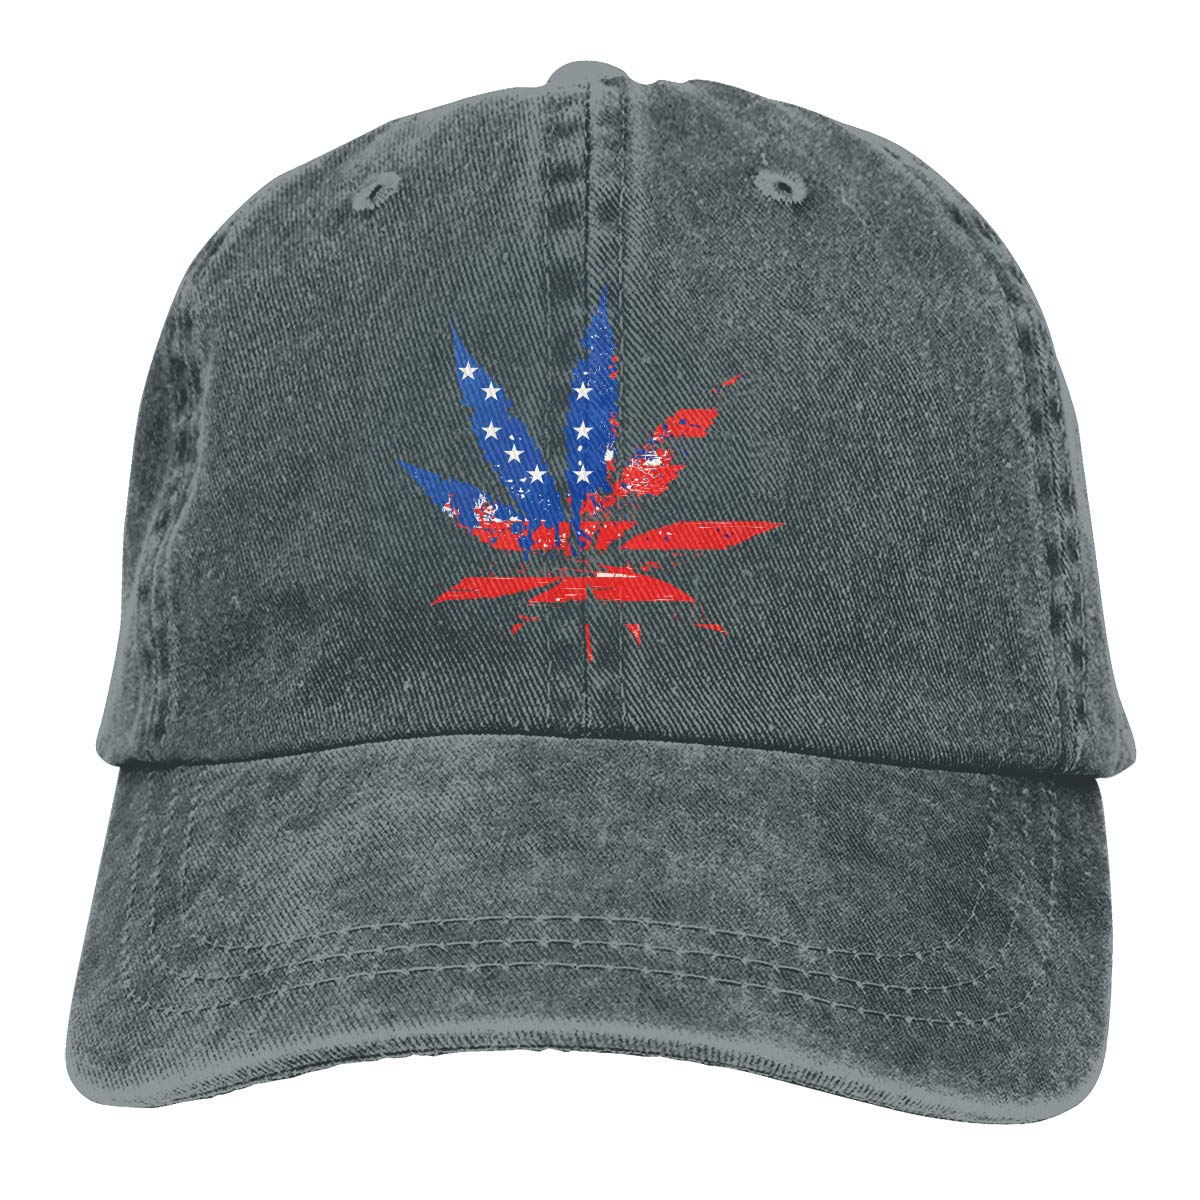 US Weed Flag Fashion Unisex Washed Cap Adjustable Dads Denim Stetson Hat